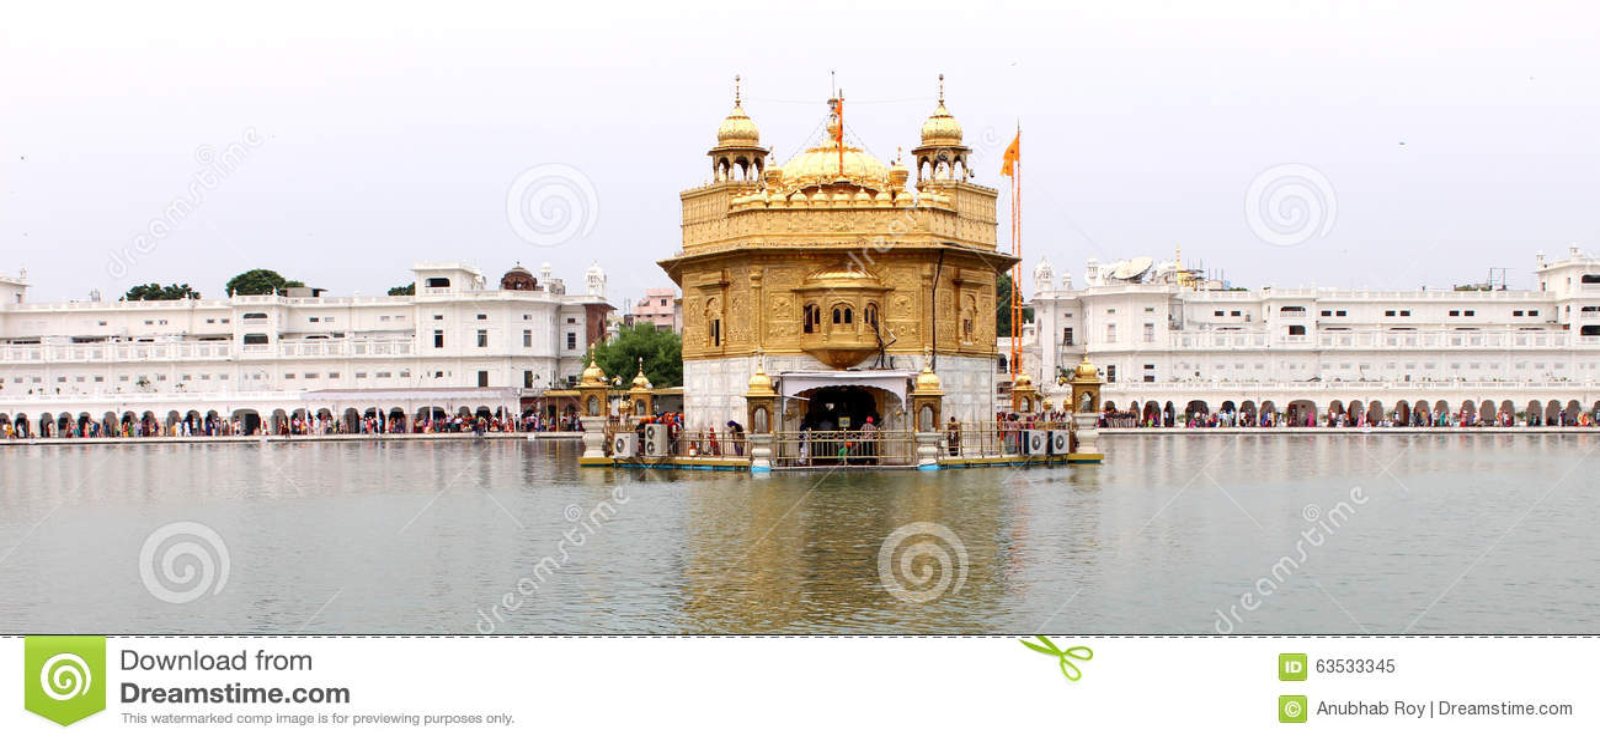 The Golden Temple, Amritsar, Punjab, India Stock Image - Image of